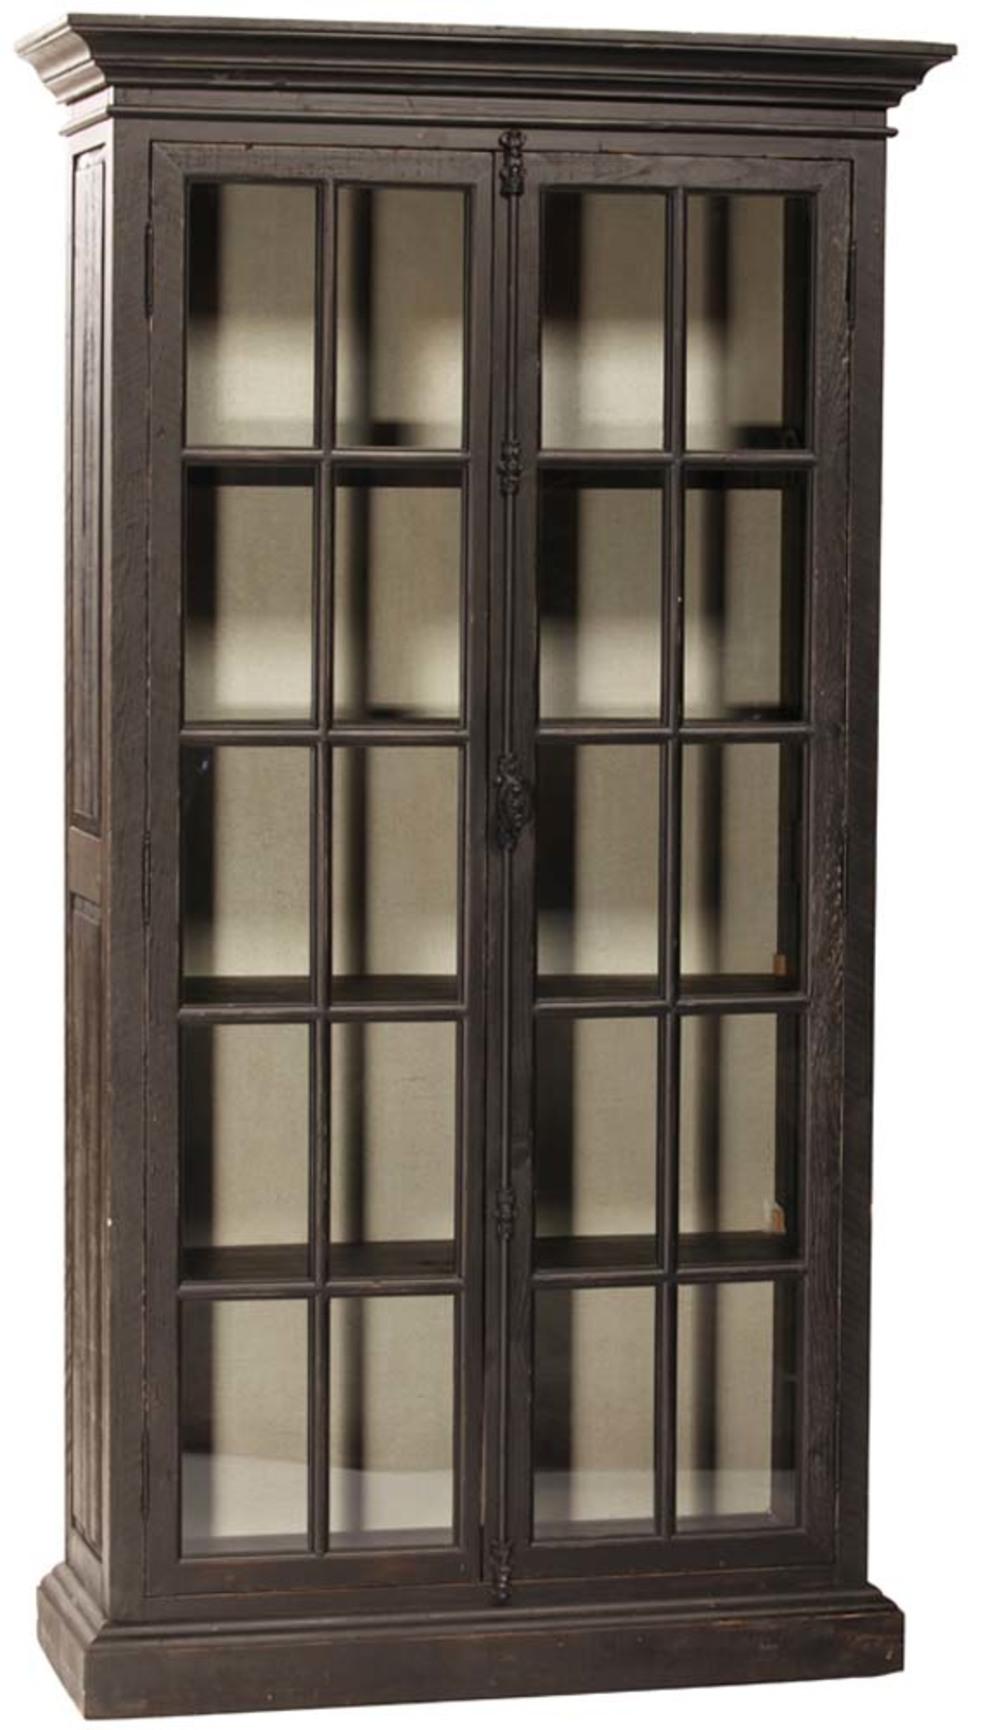 Dovetail Furniture - Barnsley Cabinet